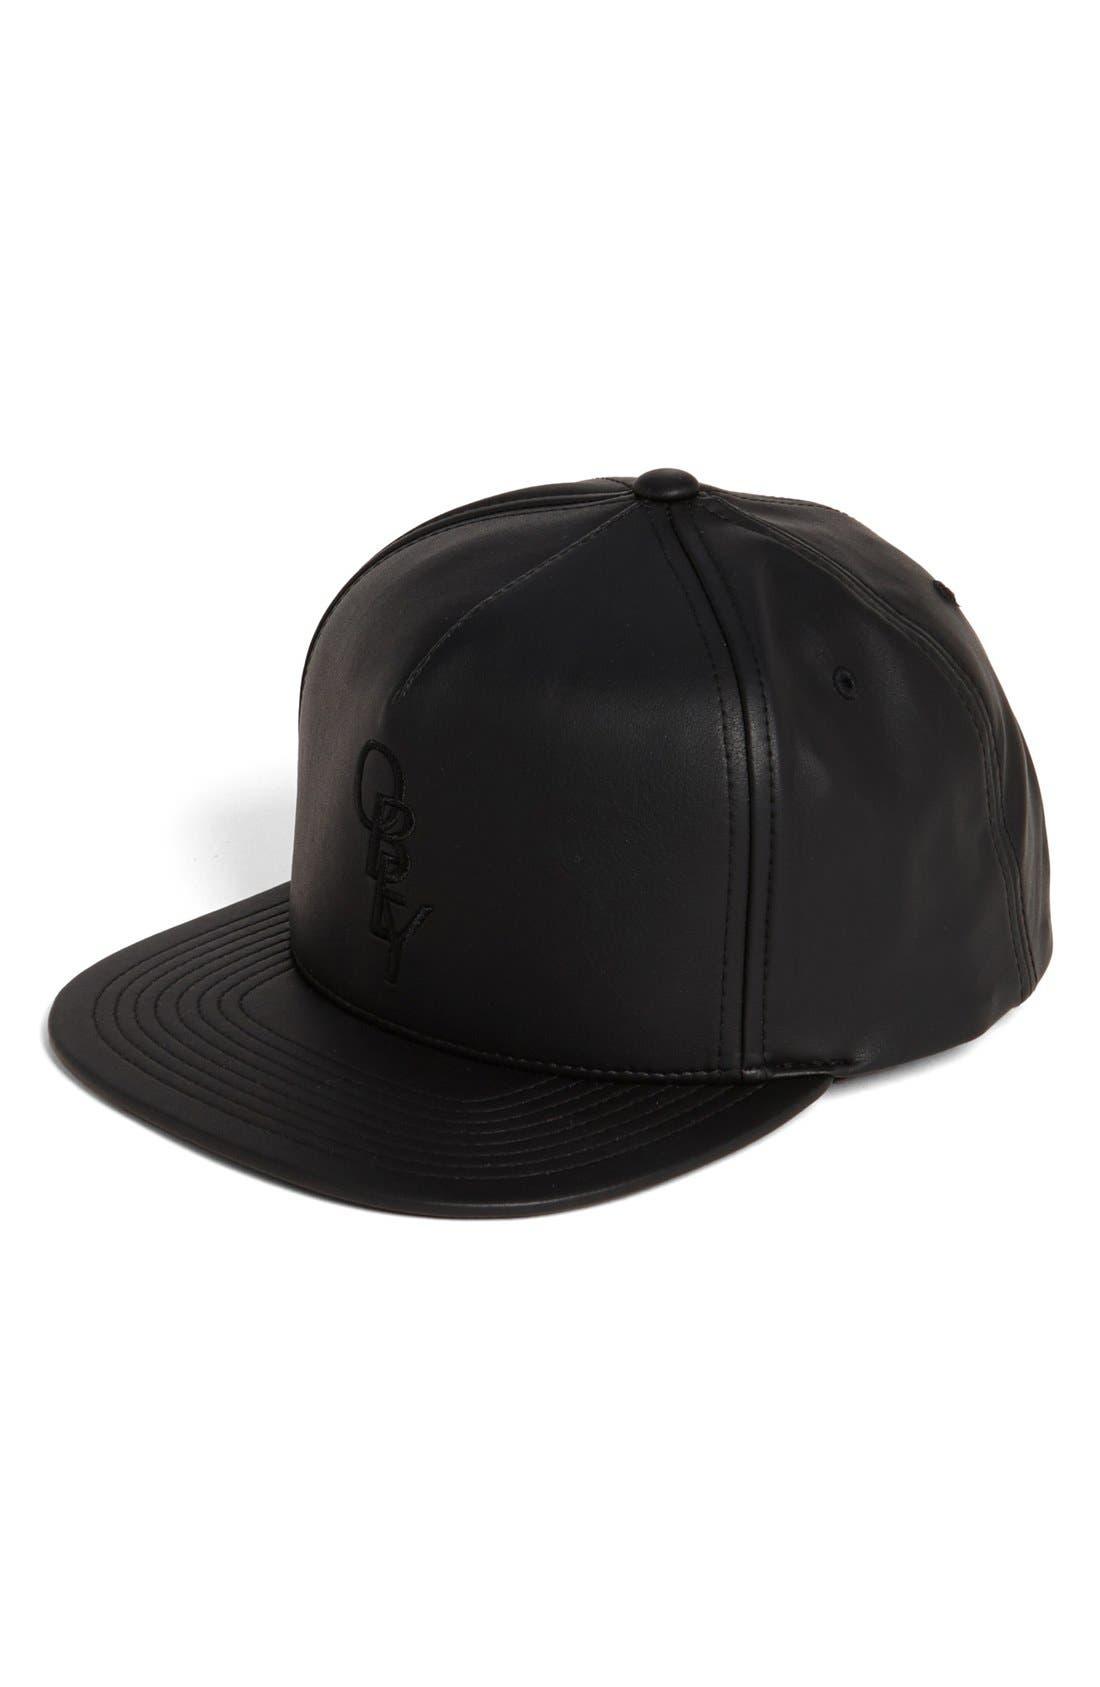 Main Image - Obey 'Premier' Snapback Baseball Cap